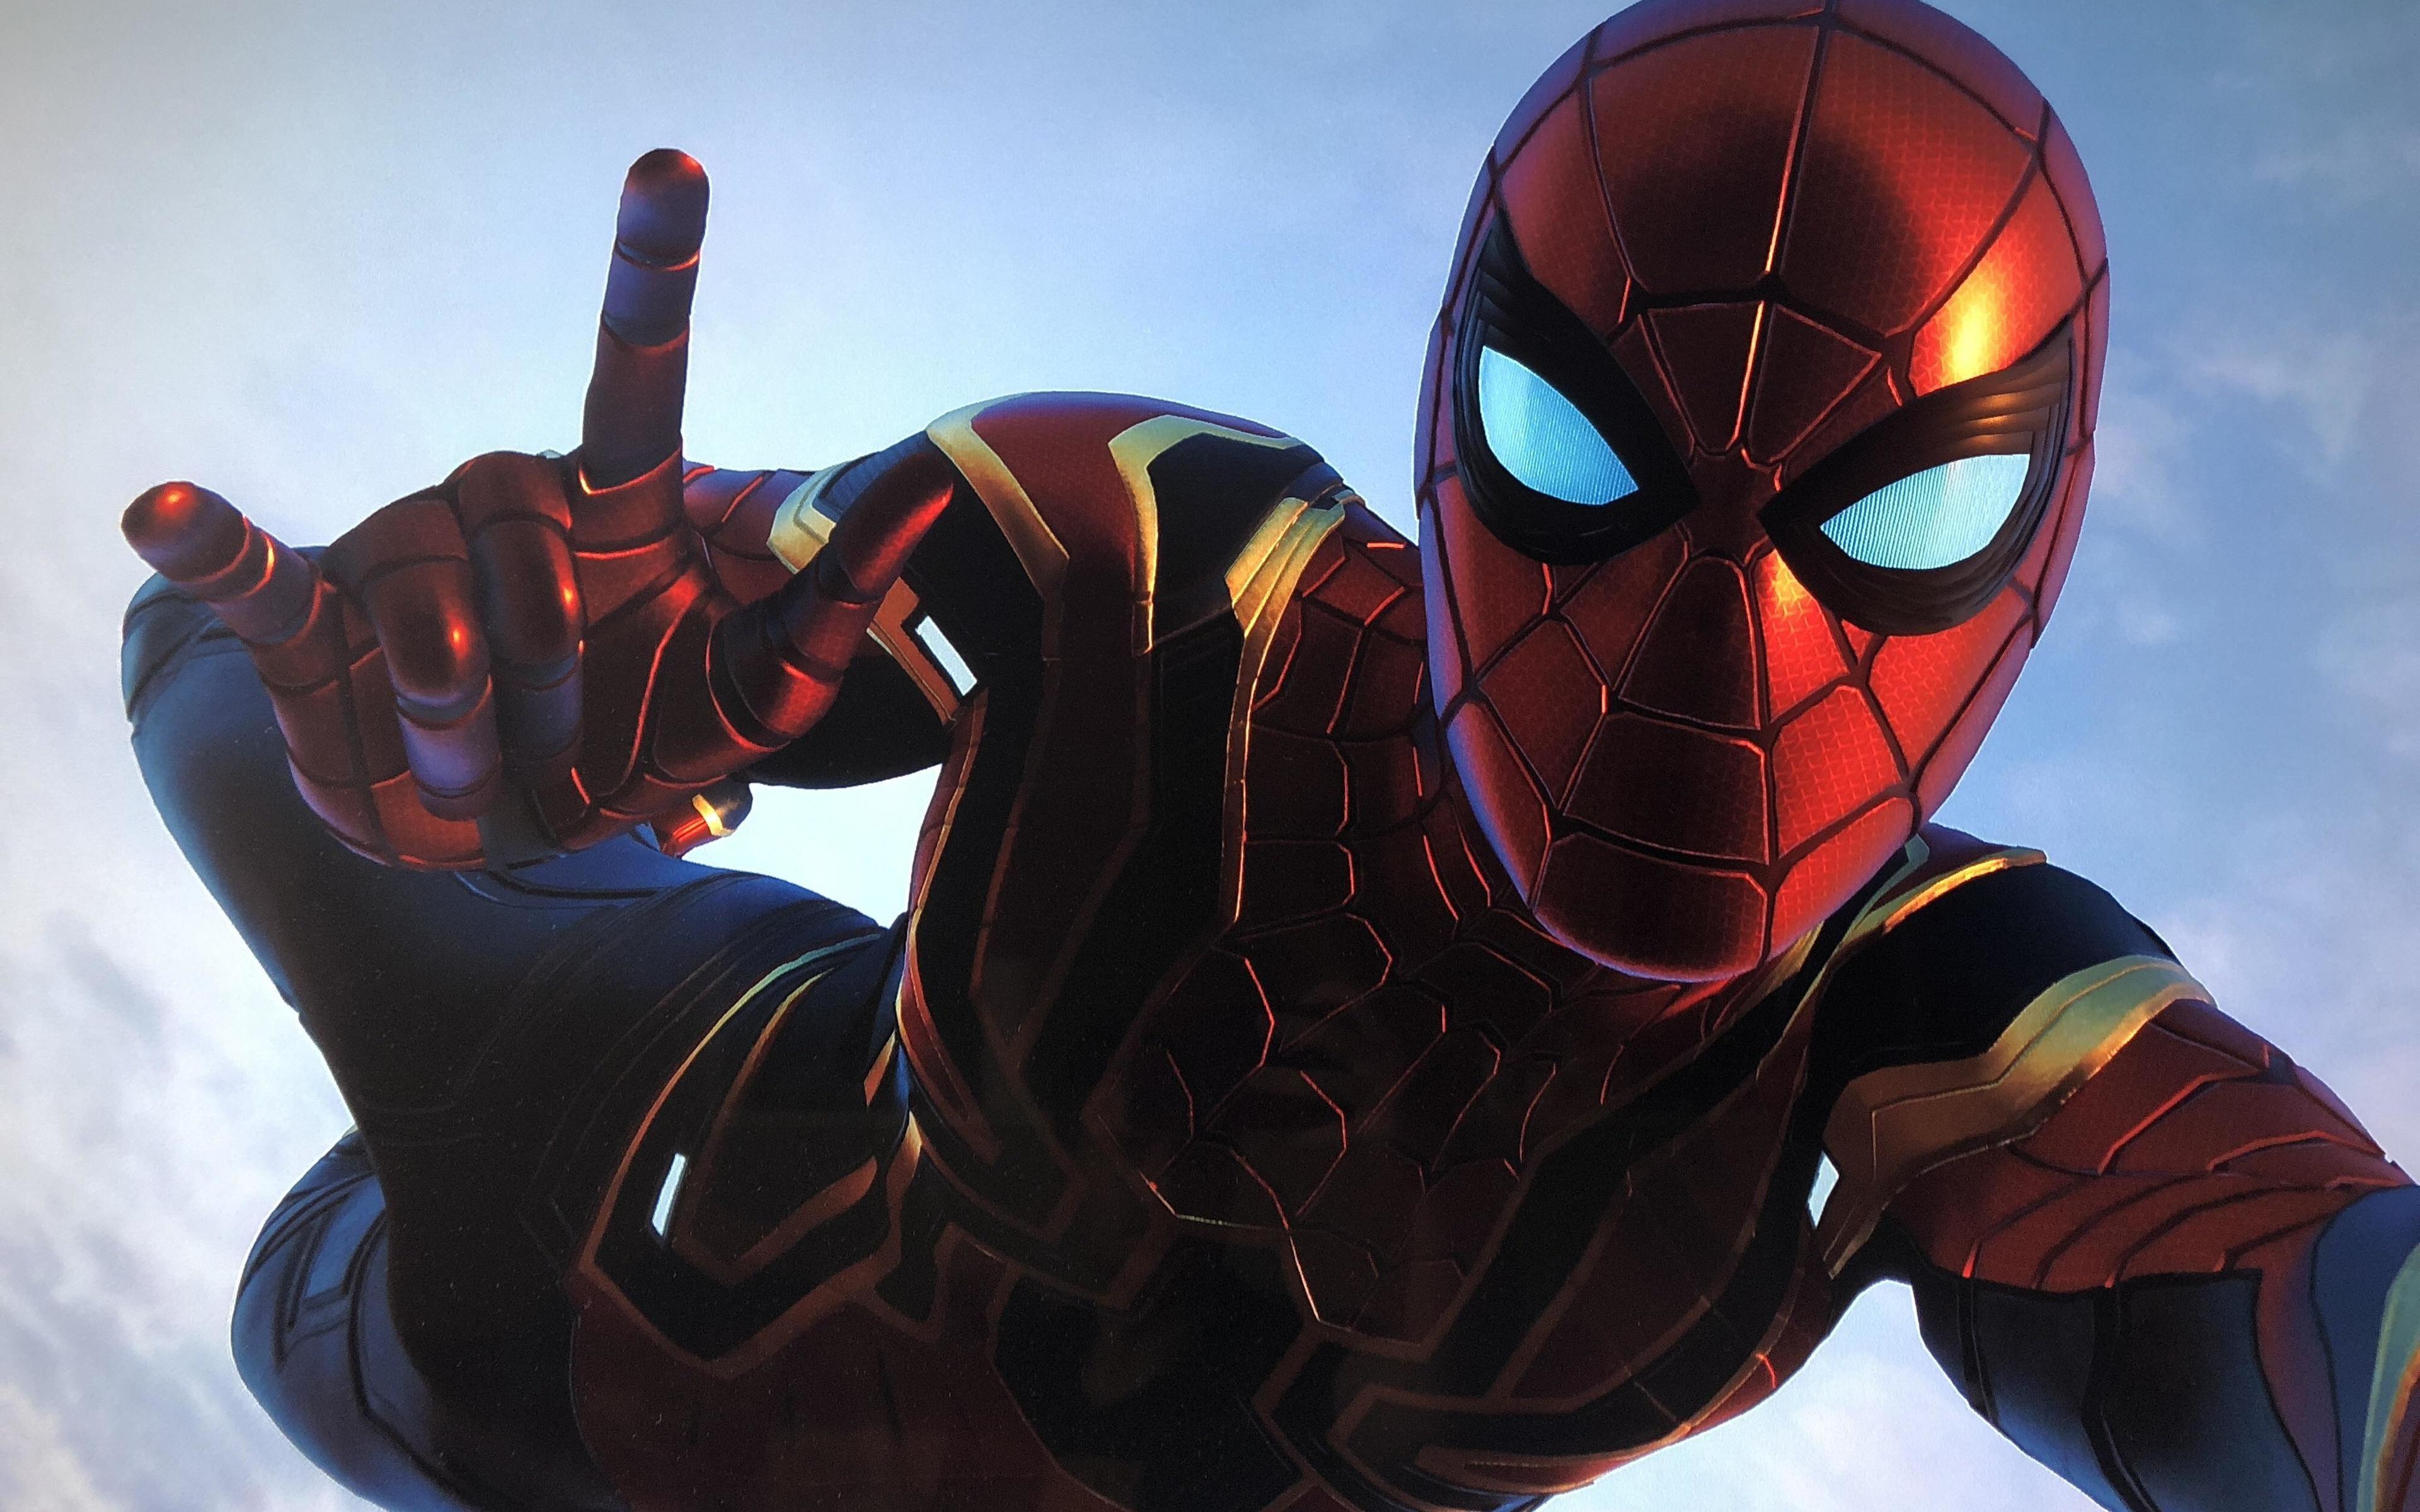 Spiderman Iron Stark Suit 4k Wallpaper Http Www Fullhdwallpapers Club 2018 10 04 Spiderman Iron Stark Suit Spiderman Artwork Spiderman Avengers Wallpaper